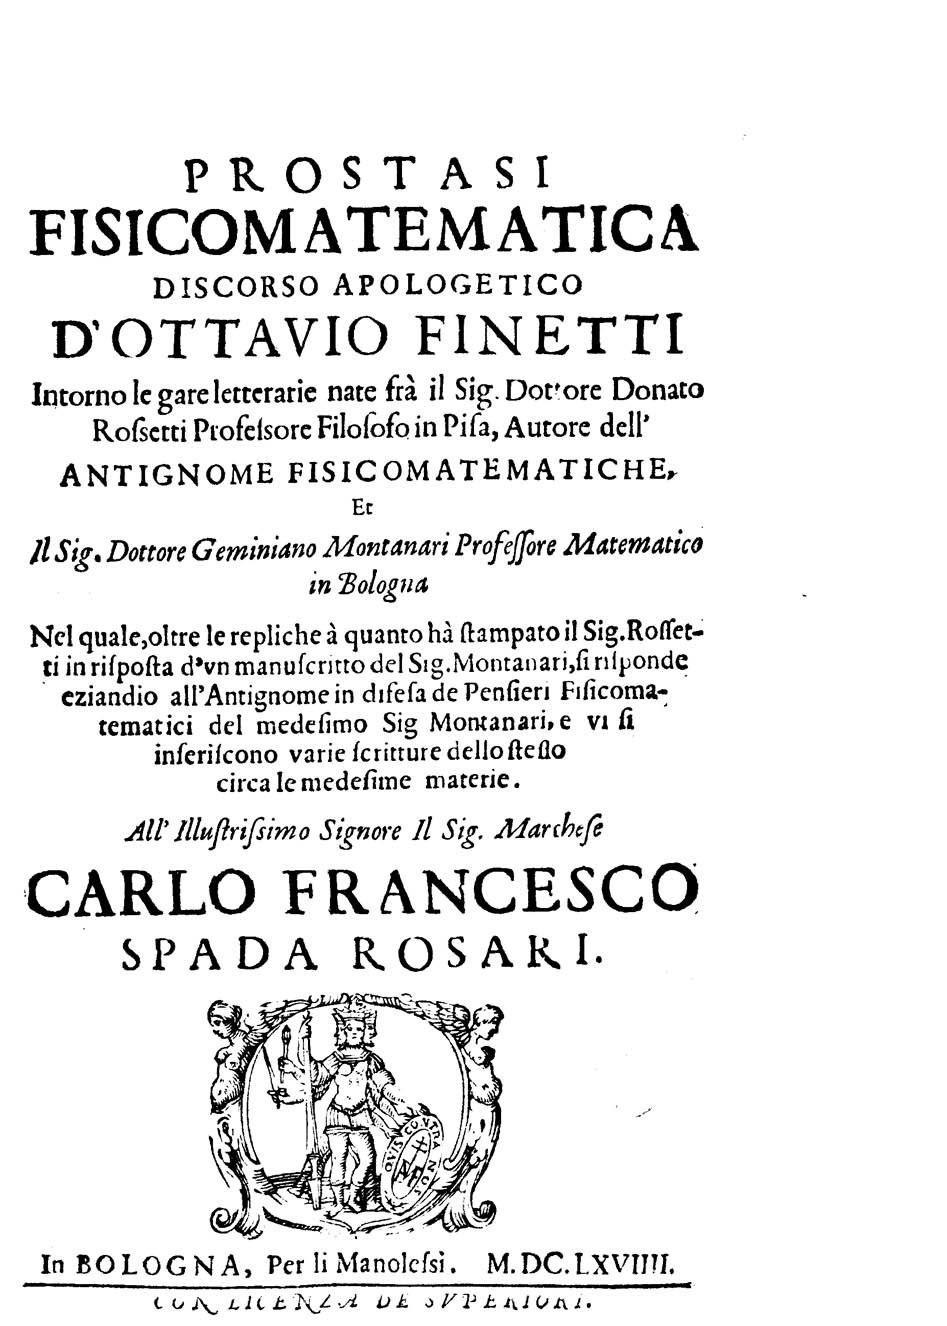 Montanari - Prostasi fisicomatematica, 1669 - 854259